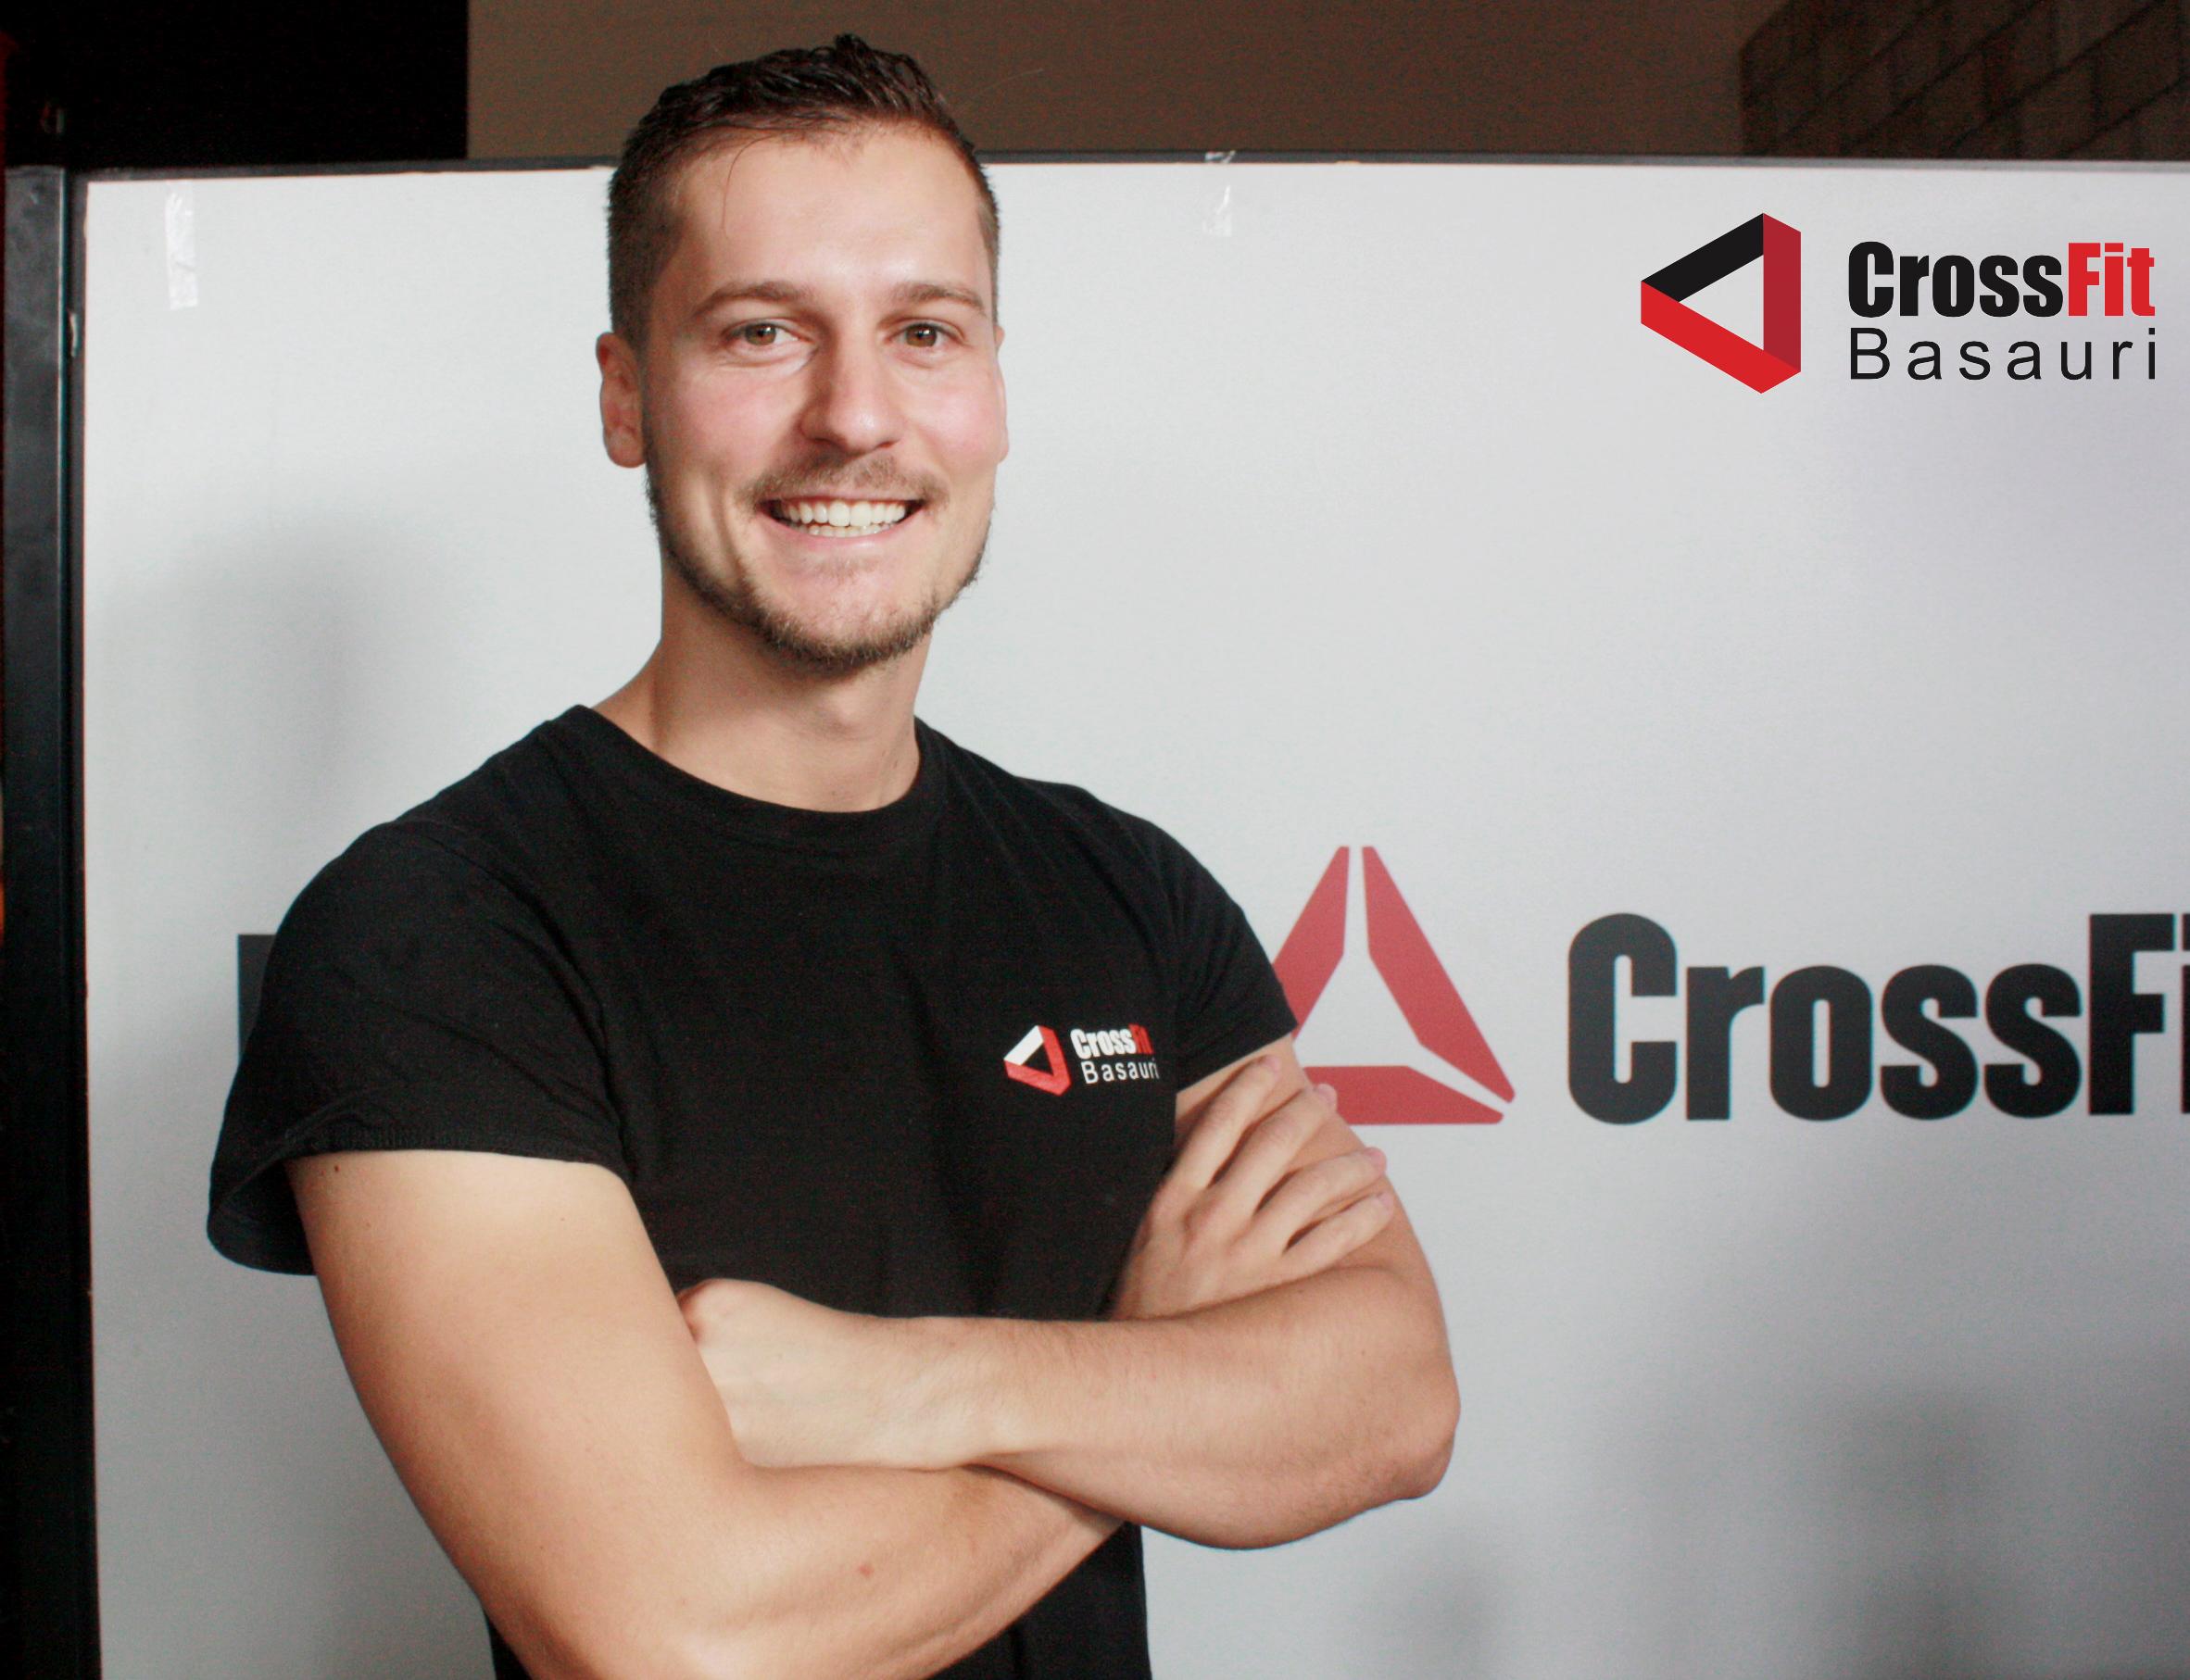 https://crossfitbasauri.com/entrenadores/iker-mate-sanz/